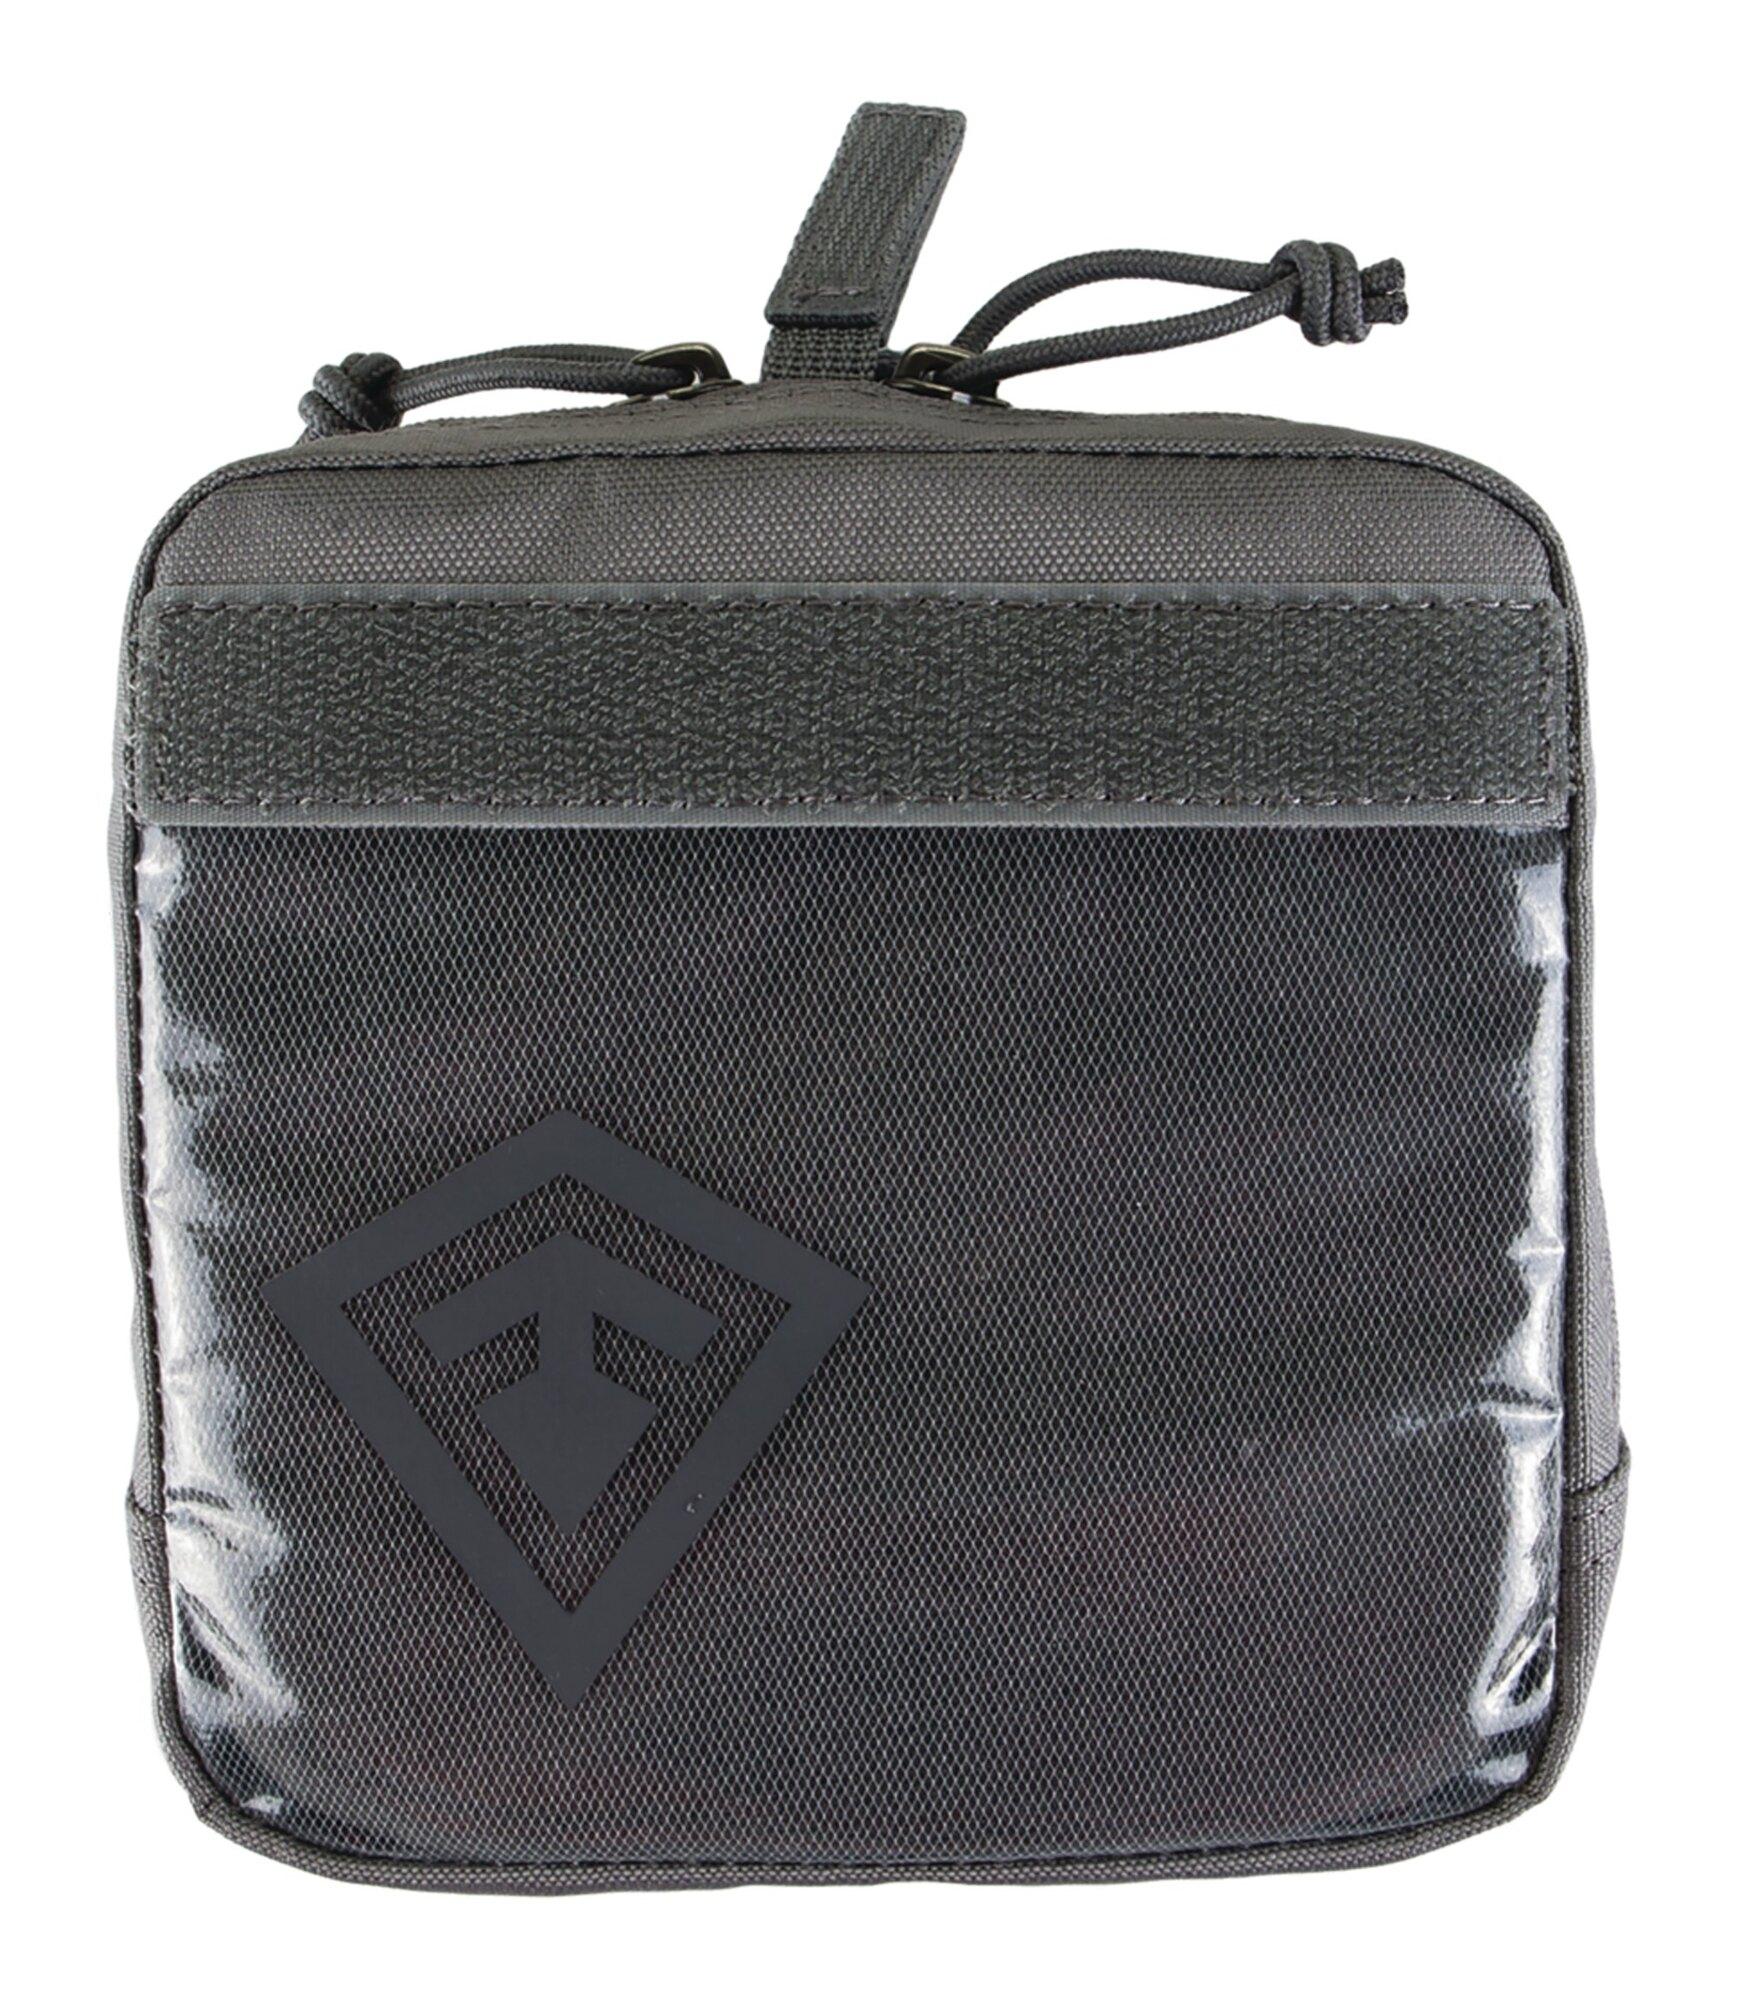 Puzdro Velcro 6x6 First Tactical® - sivé